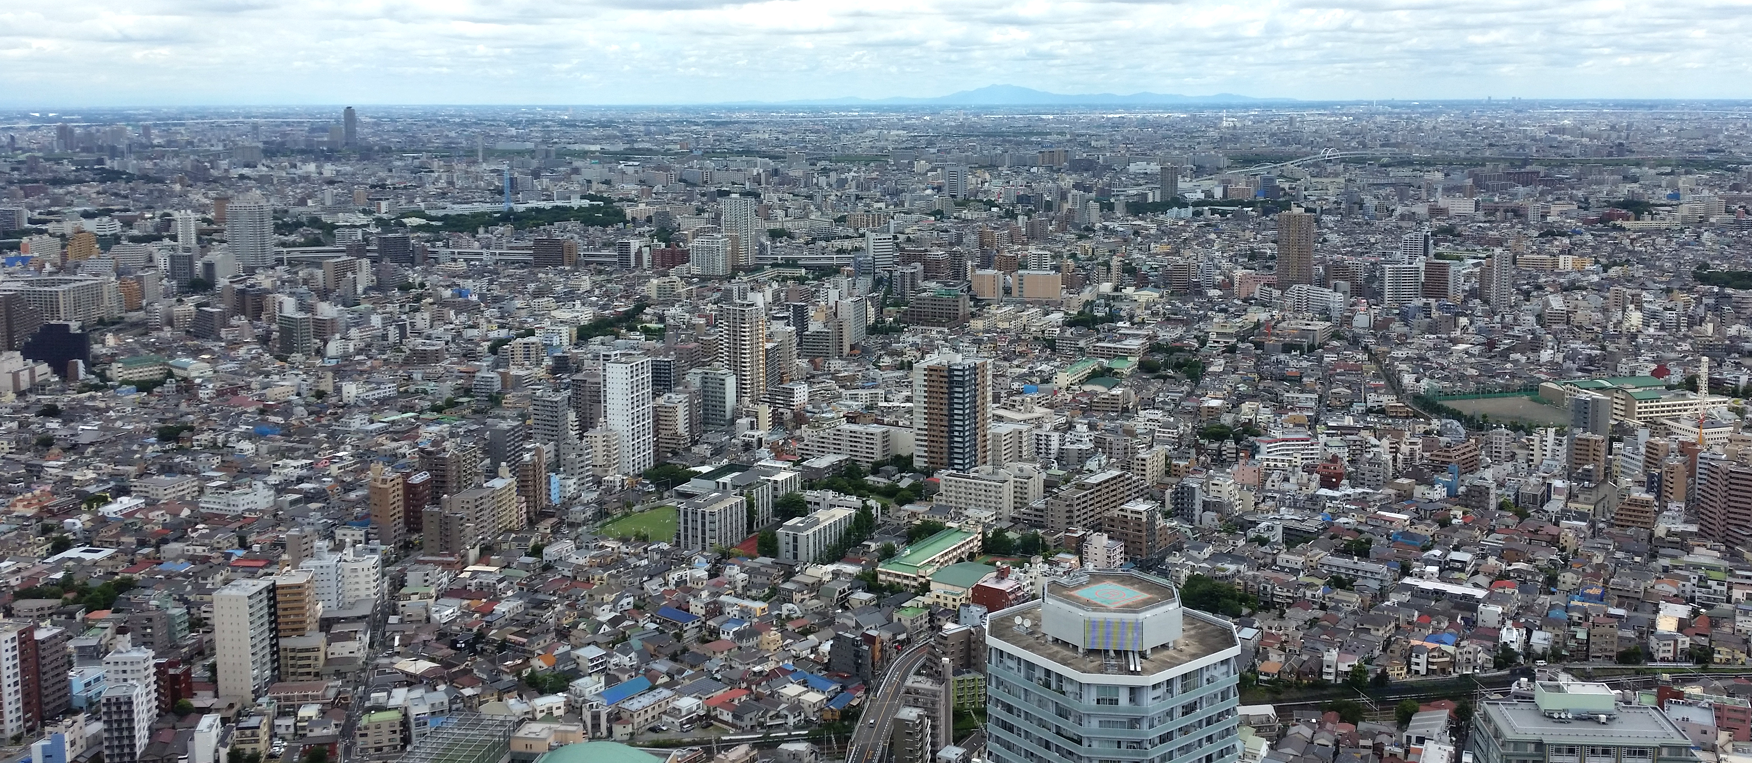 Tokyo from Sunshine 60